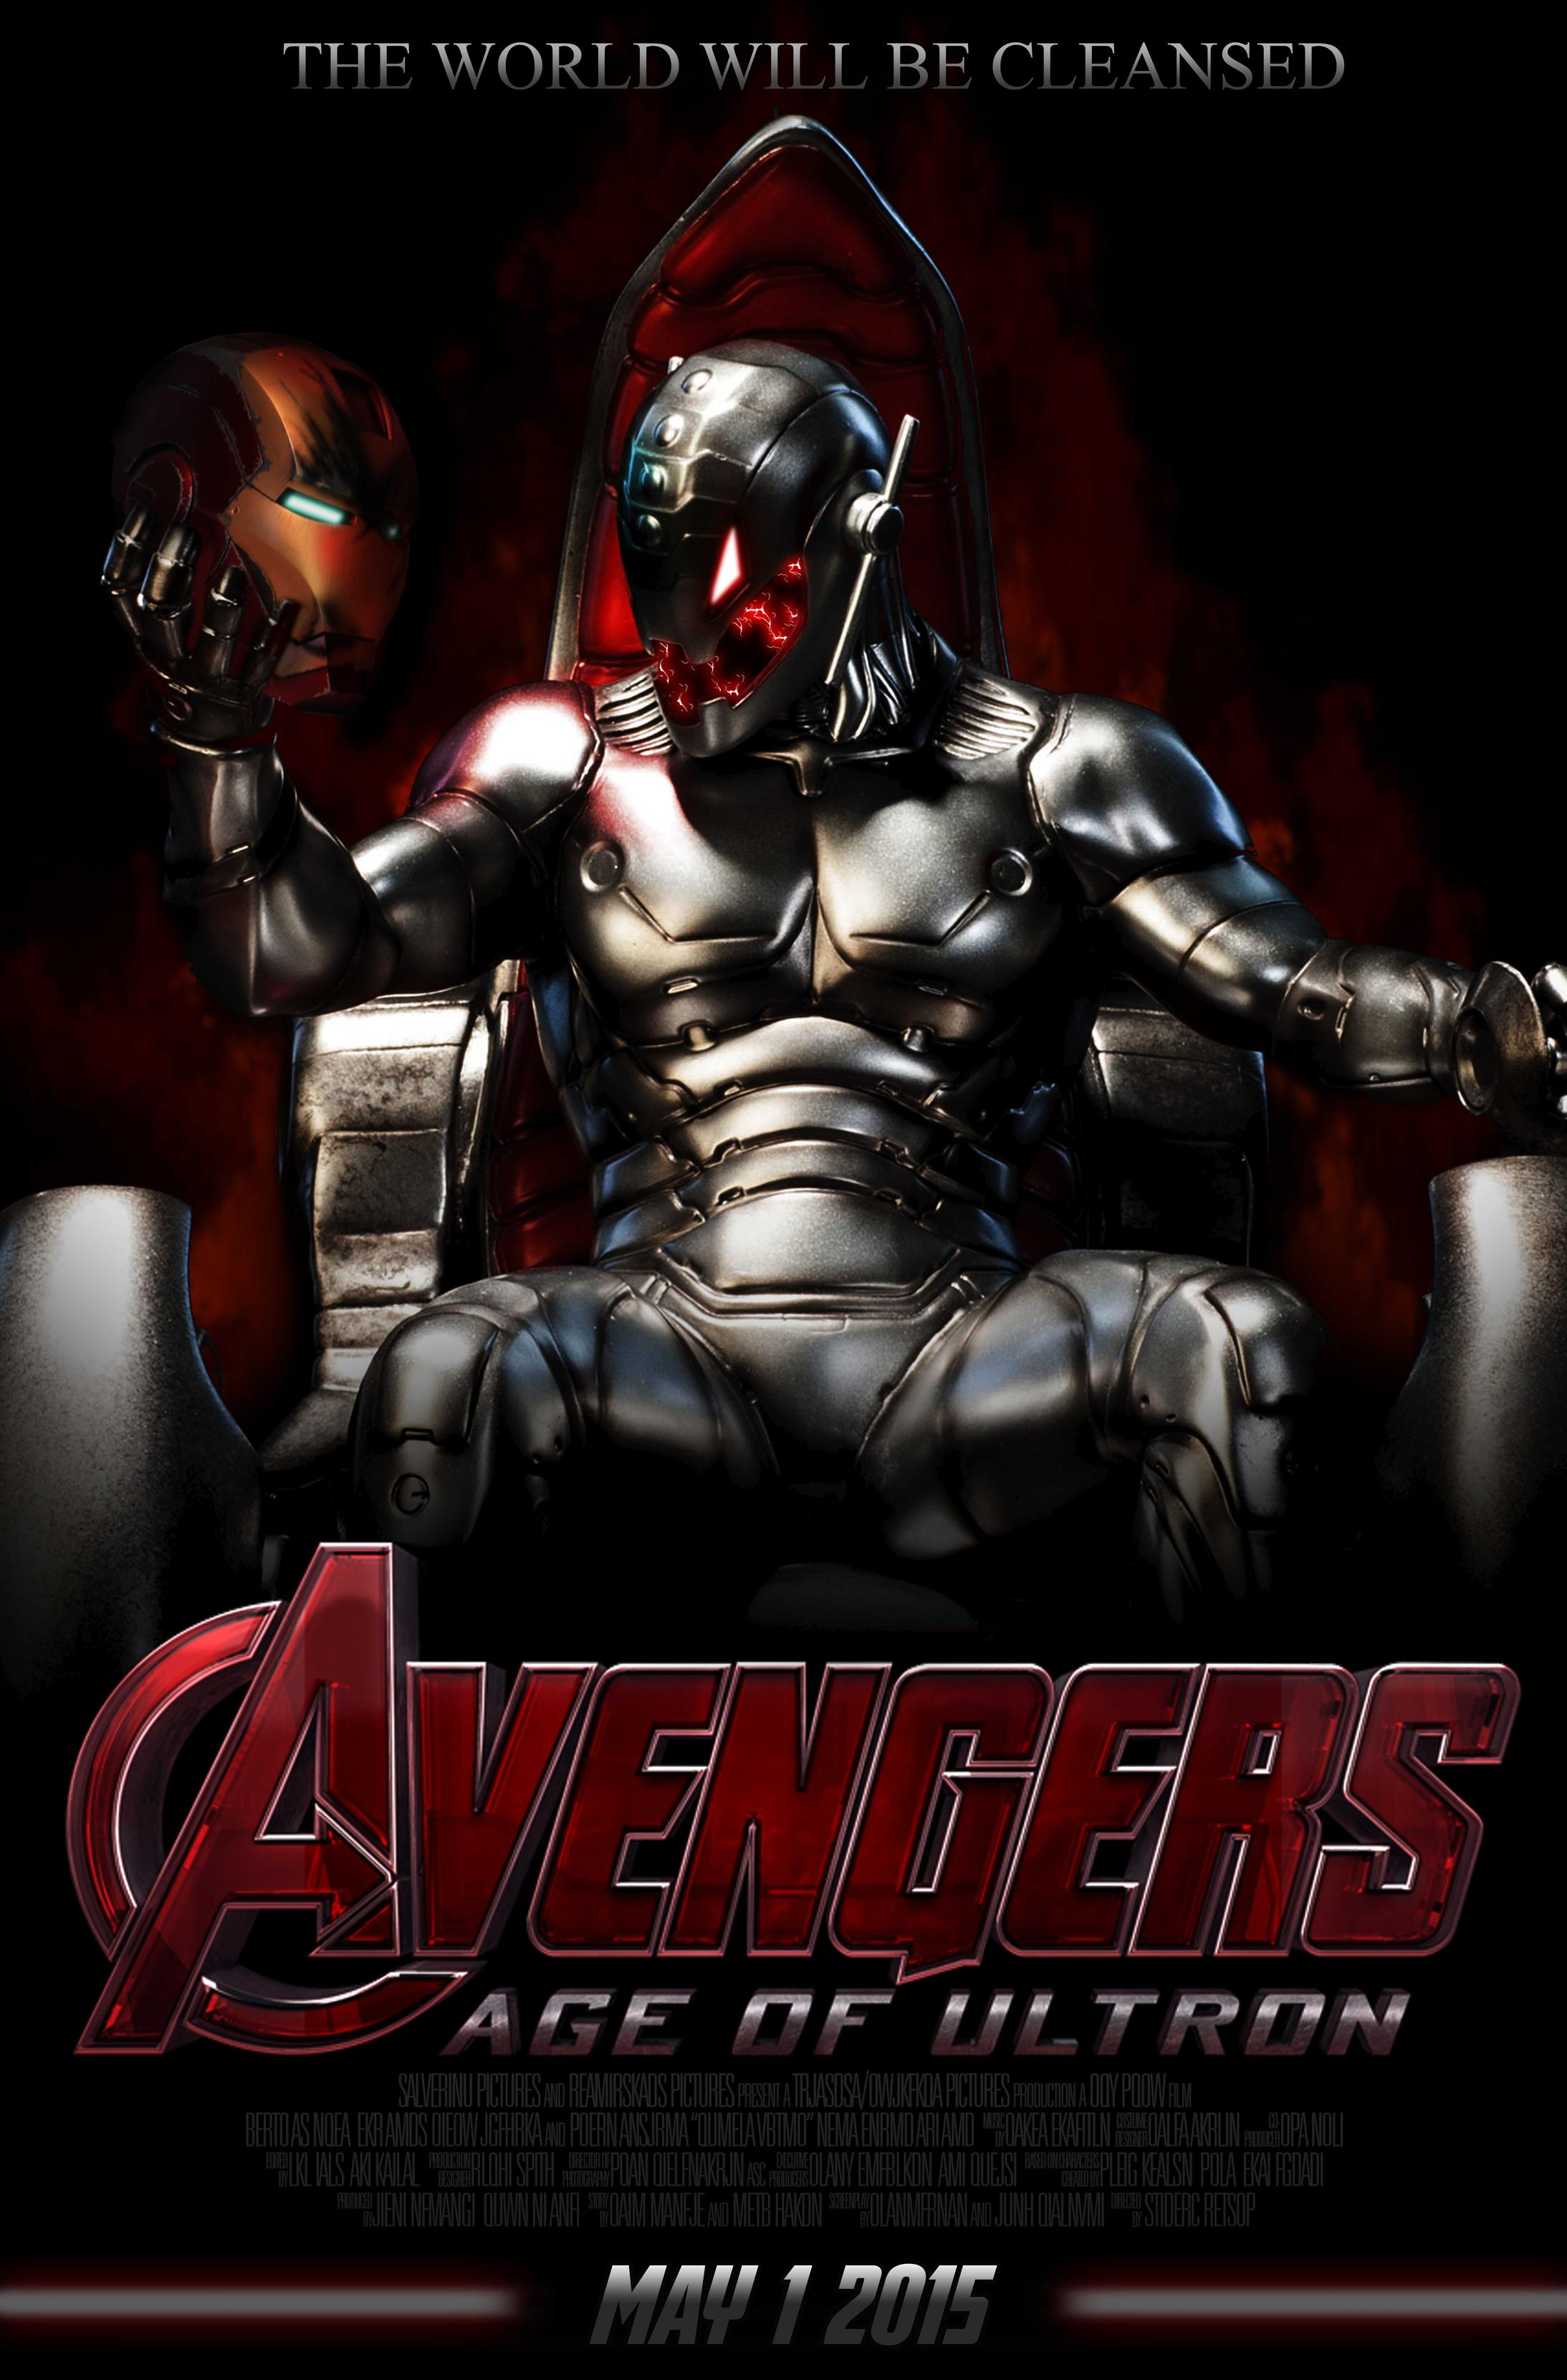 http://enfilme.com/img/content/avengers_age_of_ultron_Enfilme_99t25.jpg